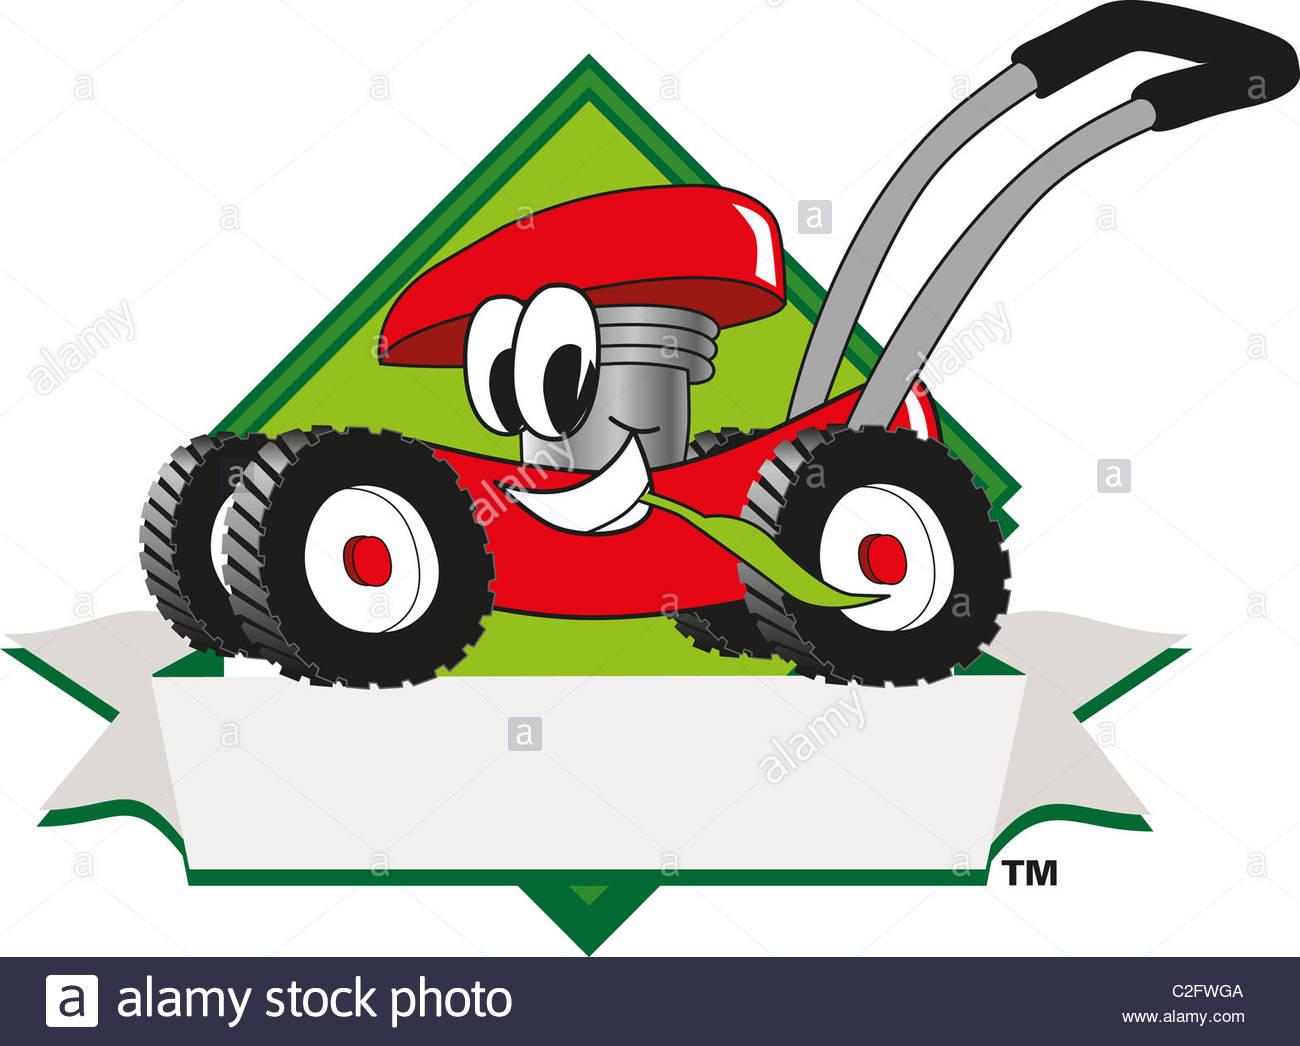 1300x1046 Cartoon Lawn Mower Clip Art And Logo Template Stock Photo, Royalty